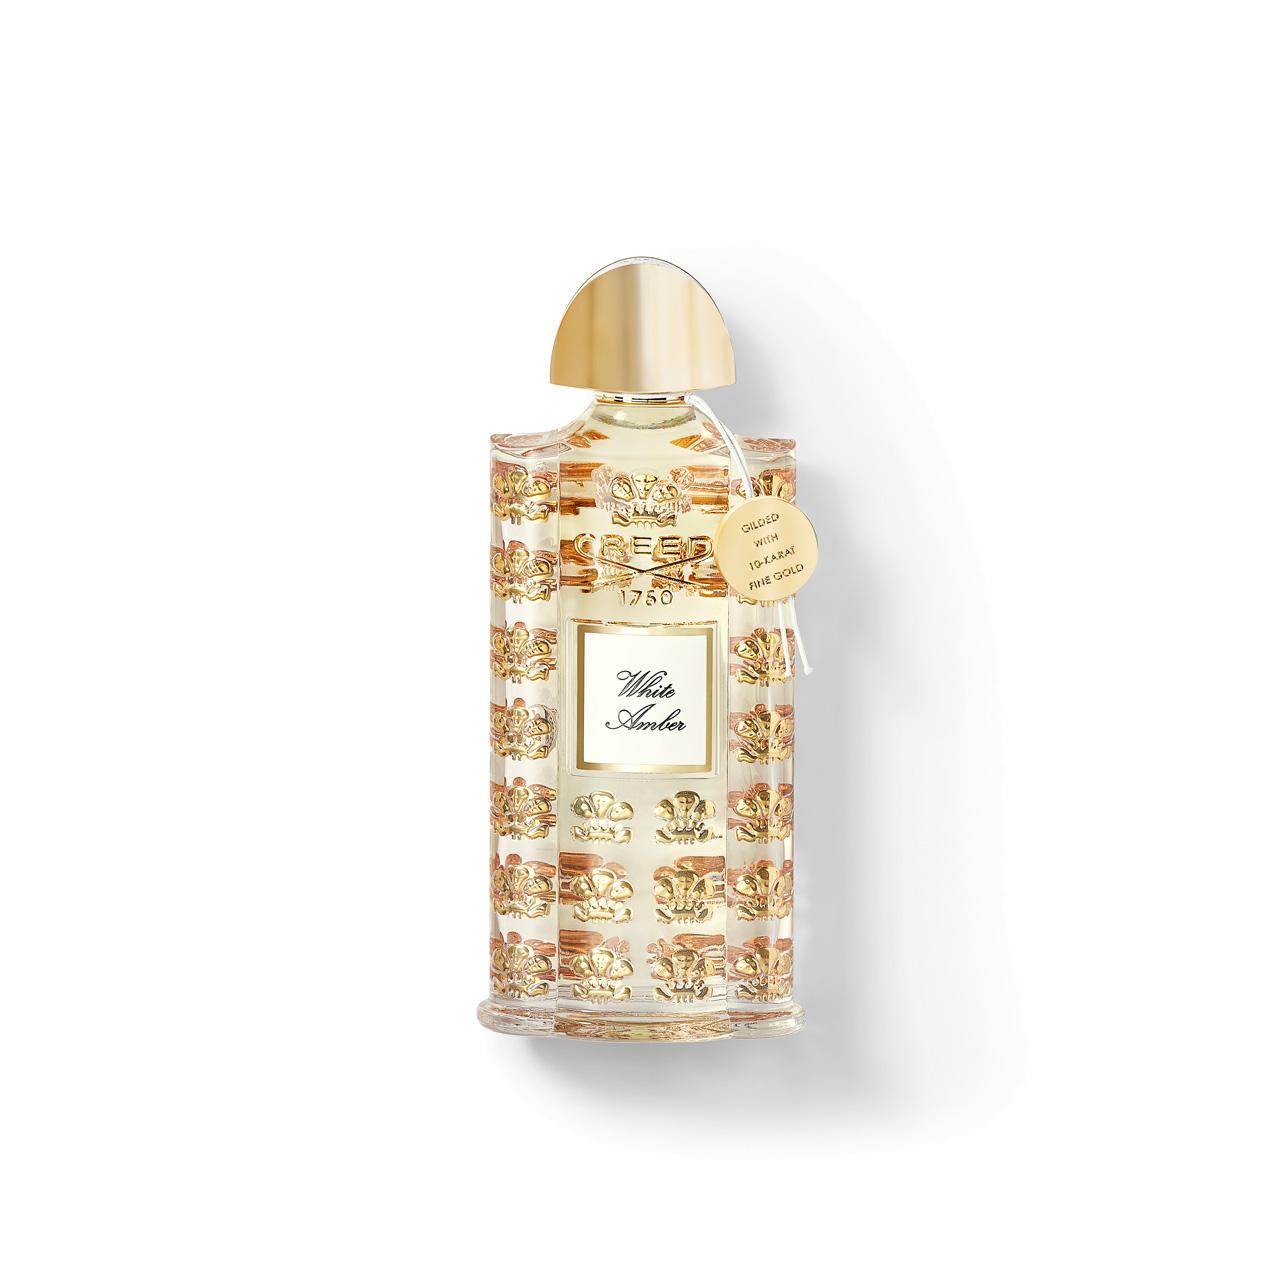 White Amber - Les Royales Exclusives Millesime